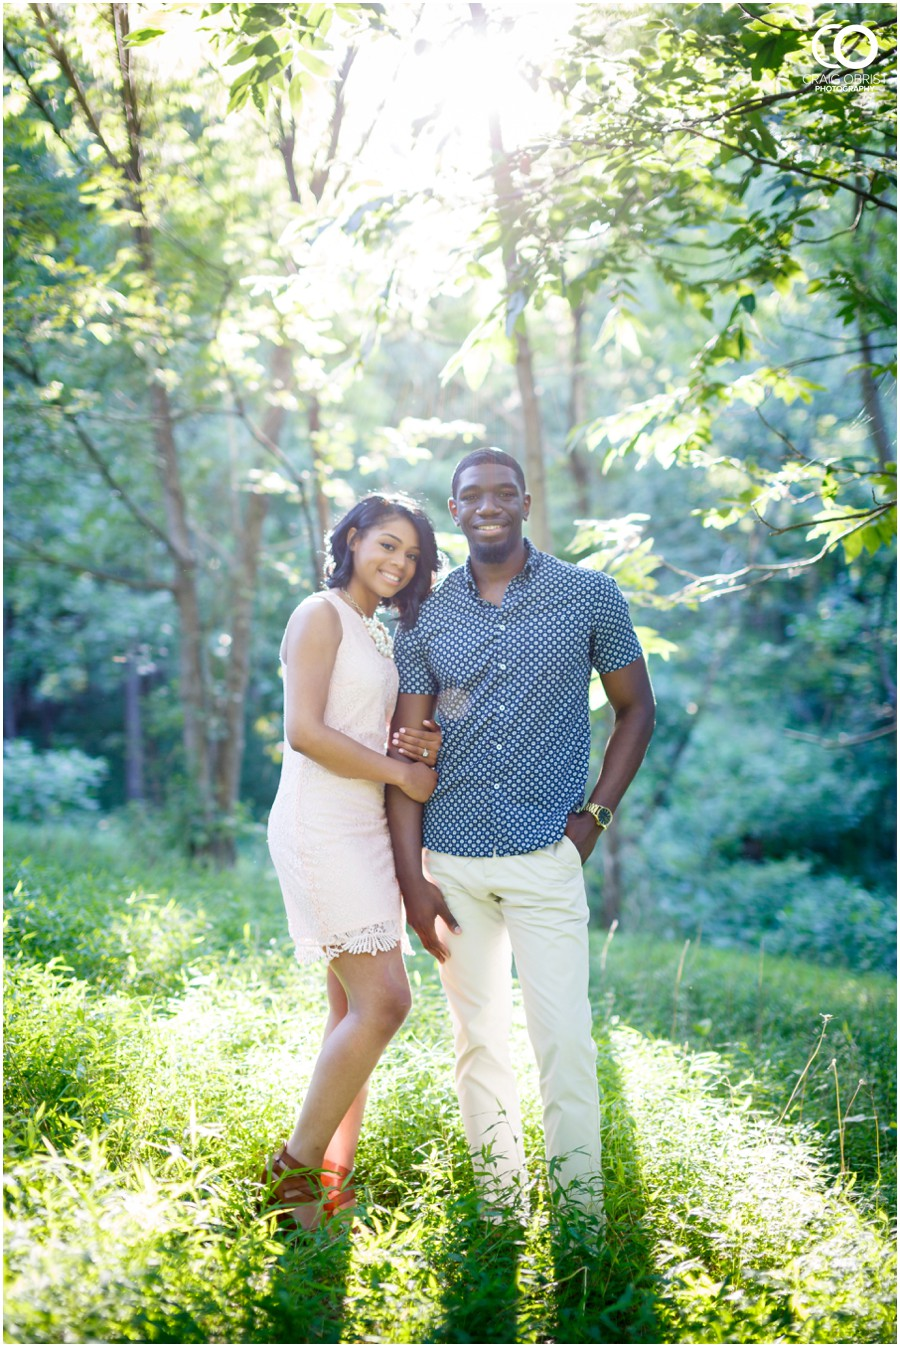 McDaniel-Farm-Park-Engagement-Portraits-Buckhead_0001.jpg